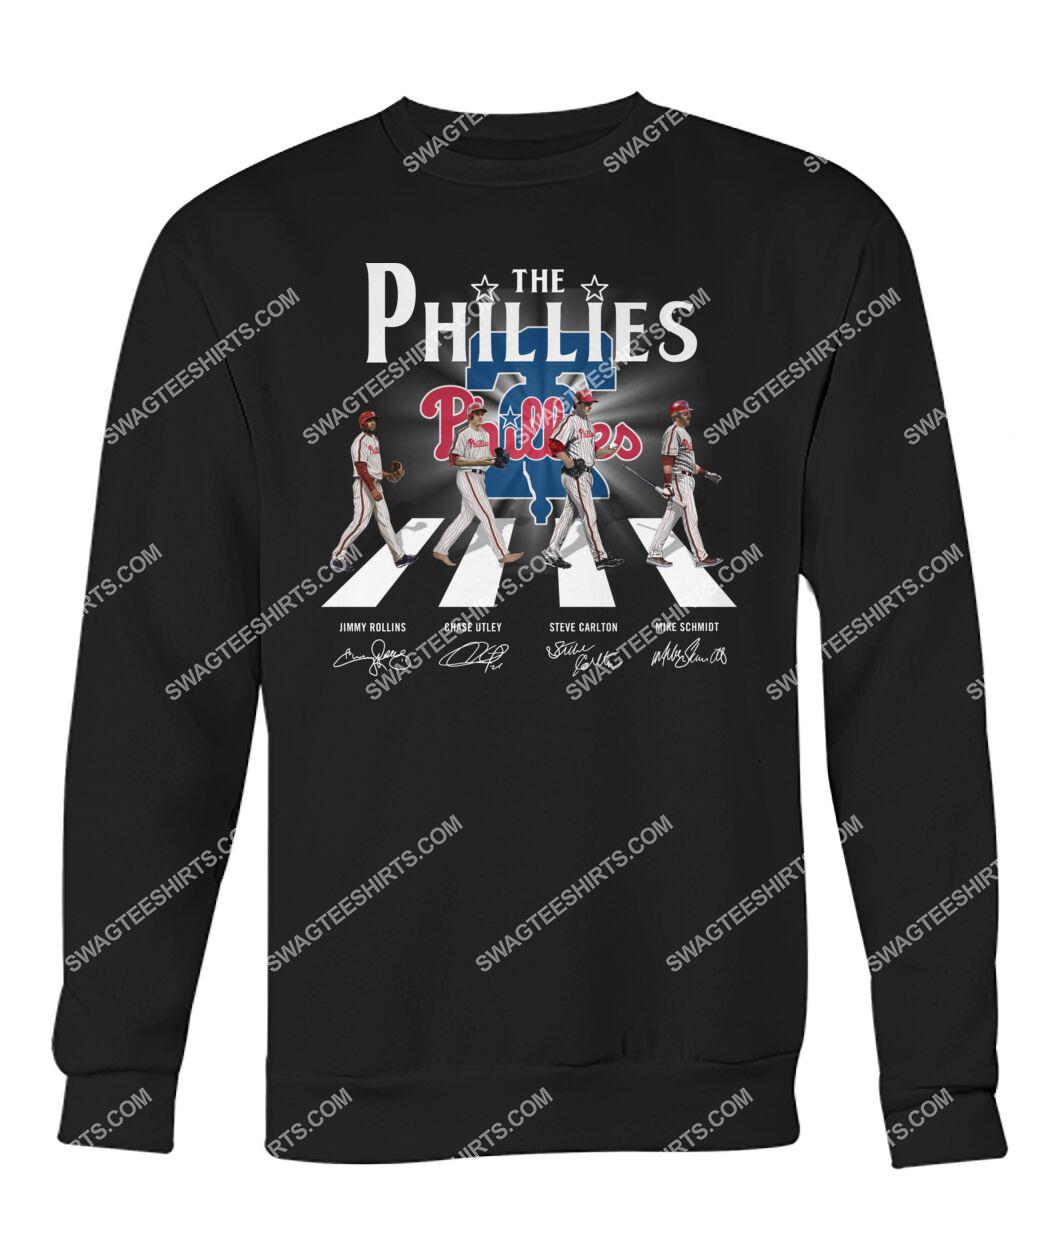 abbey road the philadelphia phillies signatures sweatshirt 1